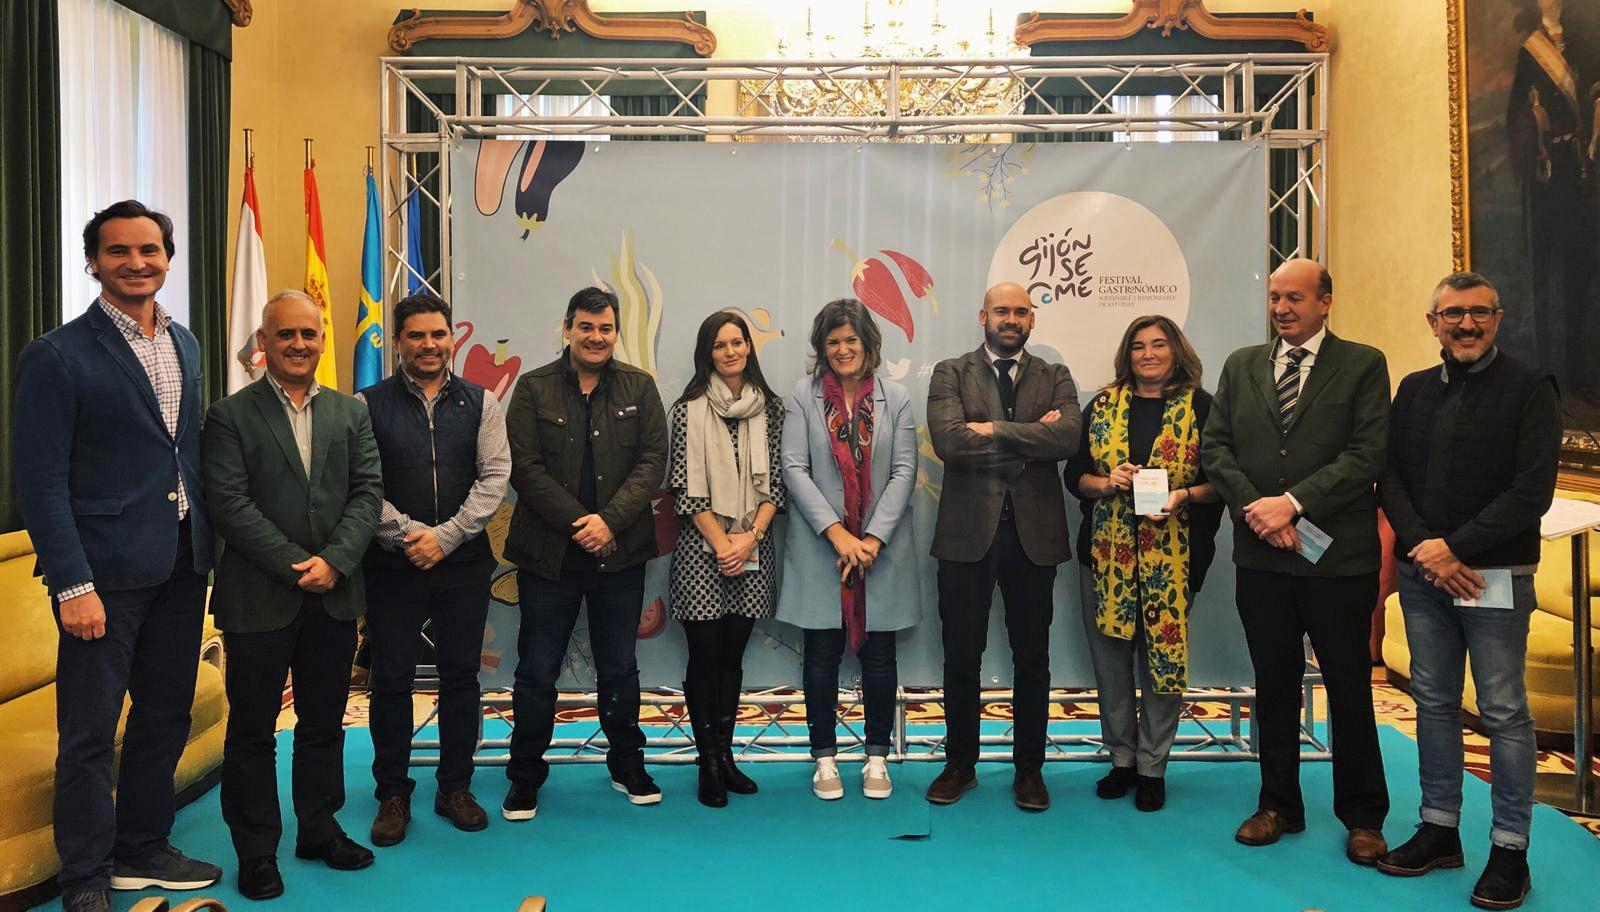 Foto de Presentación a medios del festival GijónSeCome 2018